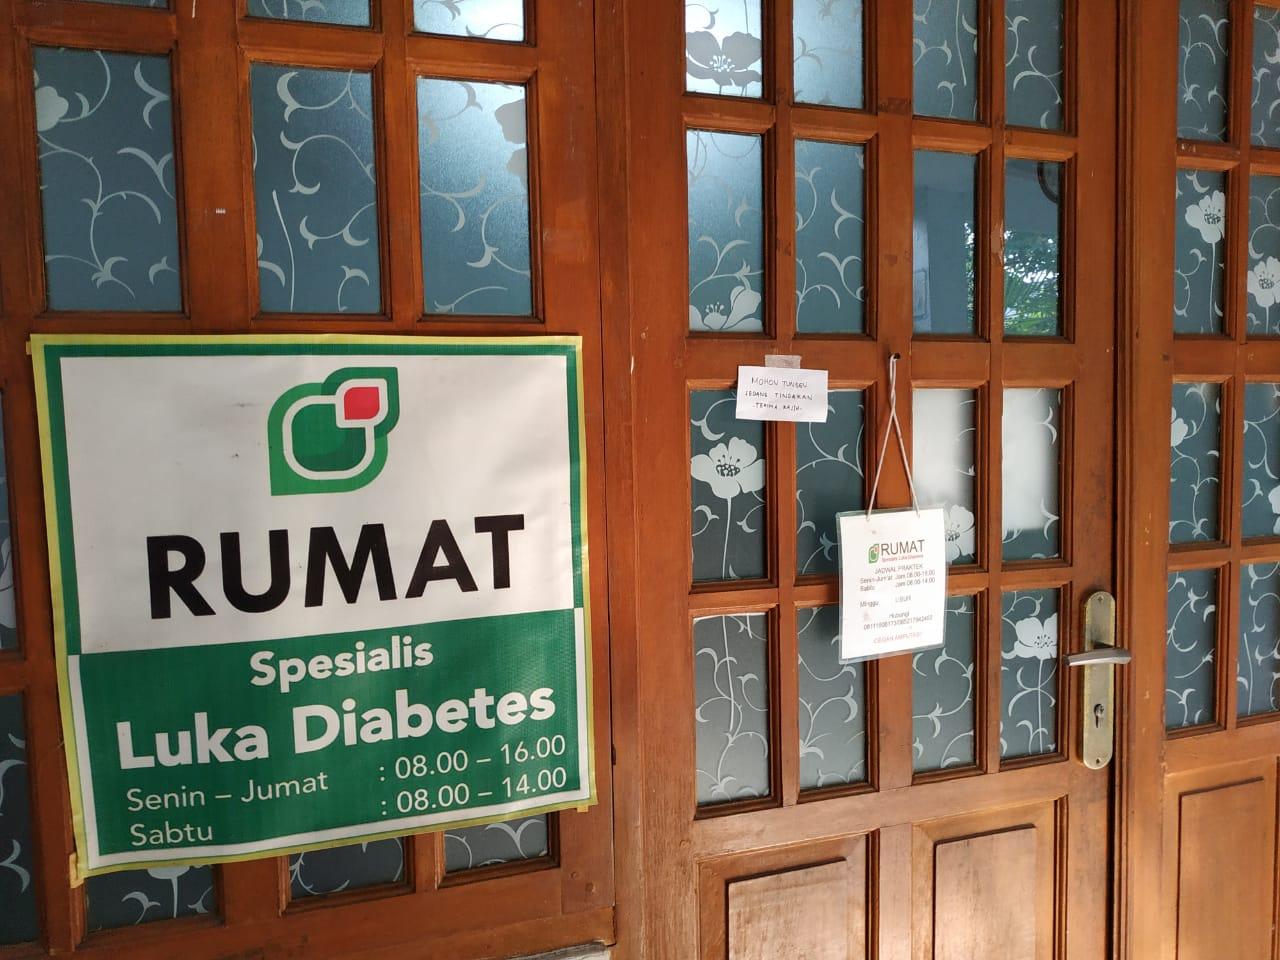 Perawatan Luka Bagi Penderita Diabetes